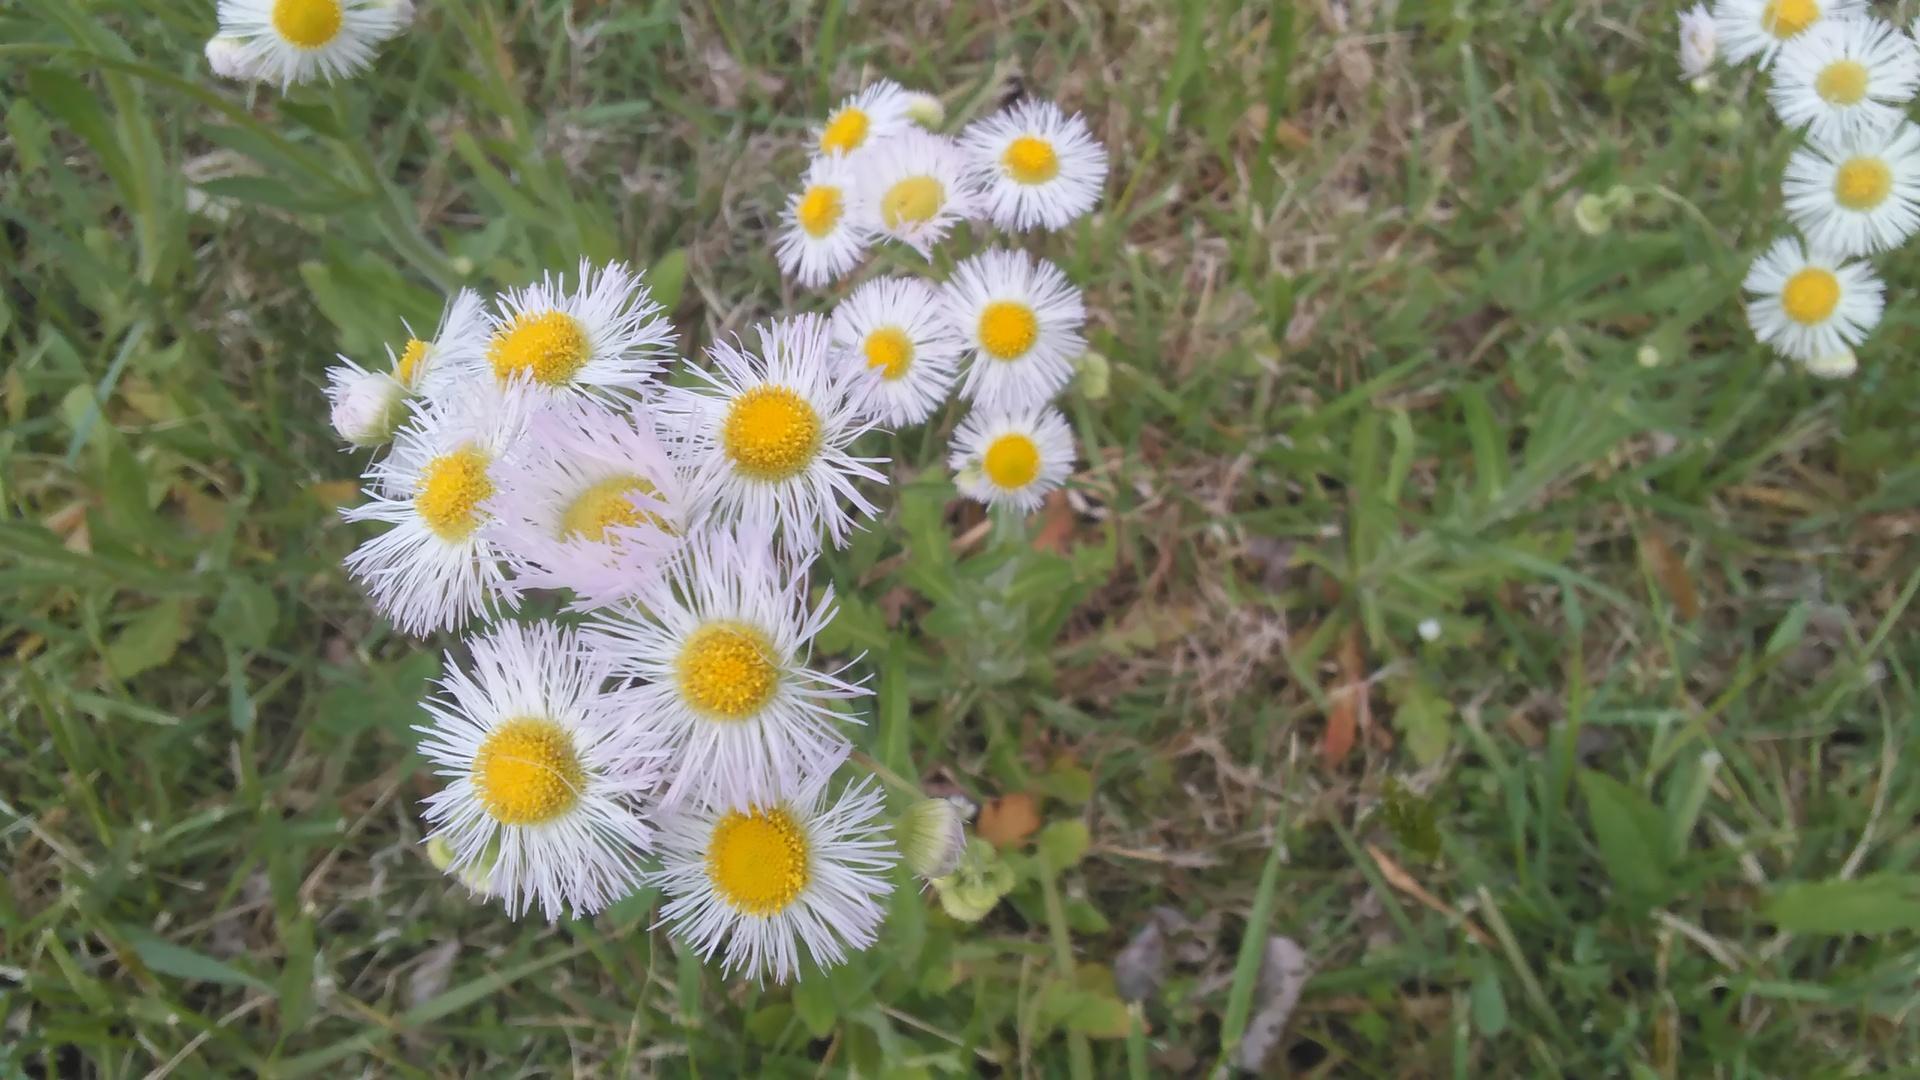 Daisies | codenamesailorearth, bloom, blossom, floral